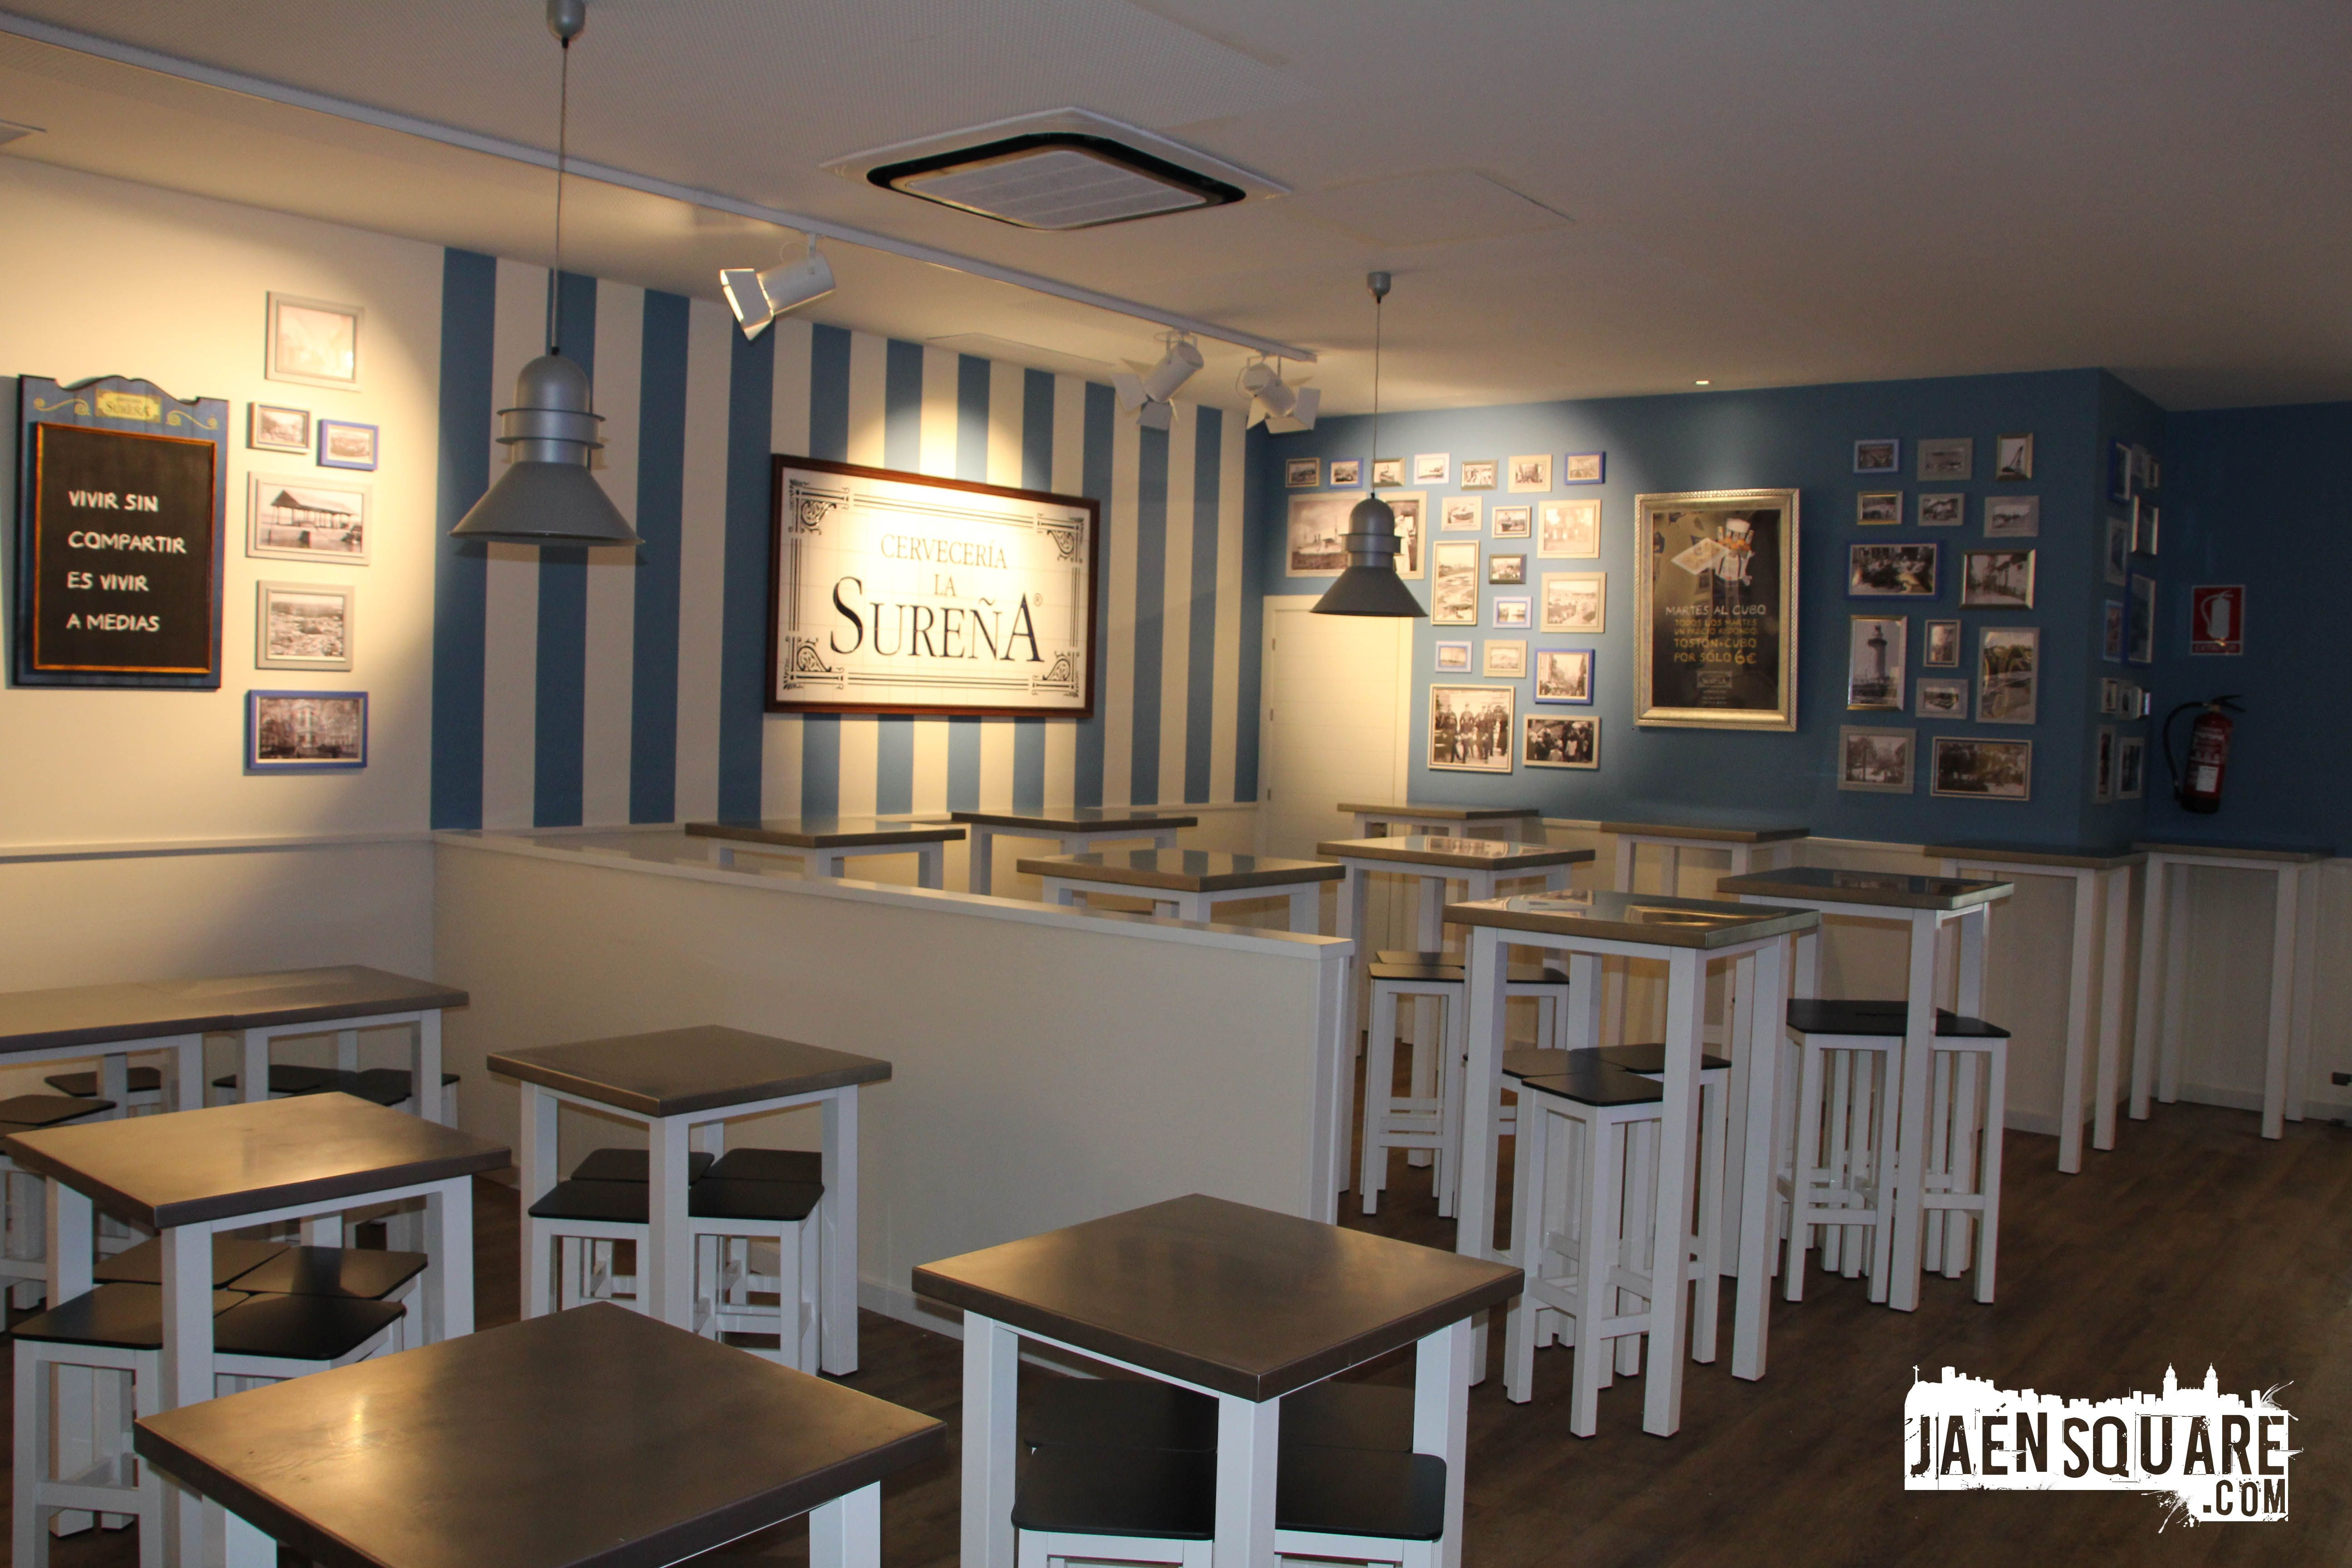 la sureña franquicias - Buscar con Google | Restaurant franchise ...